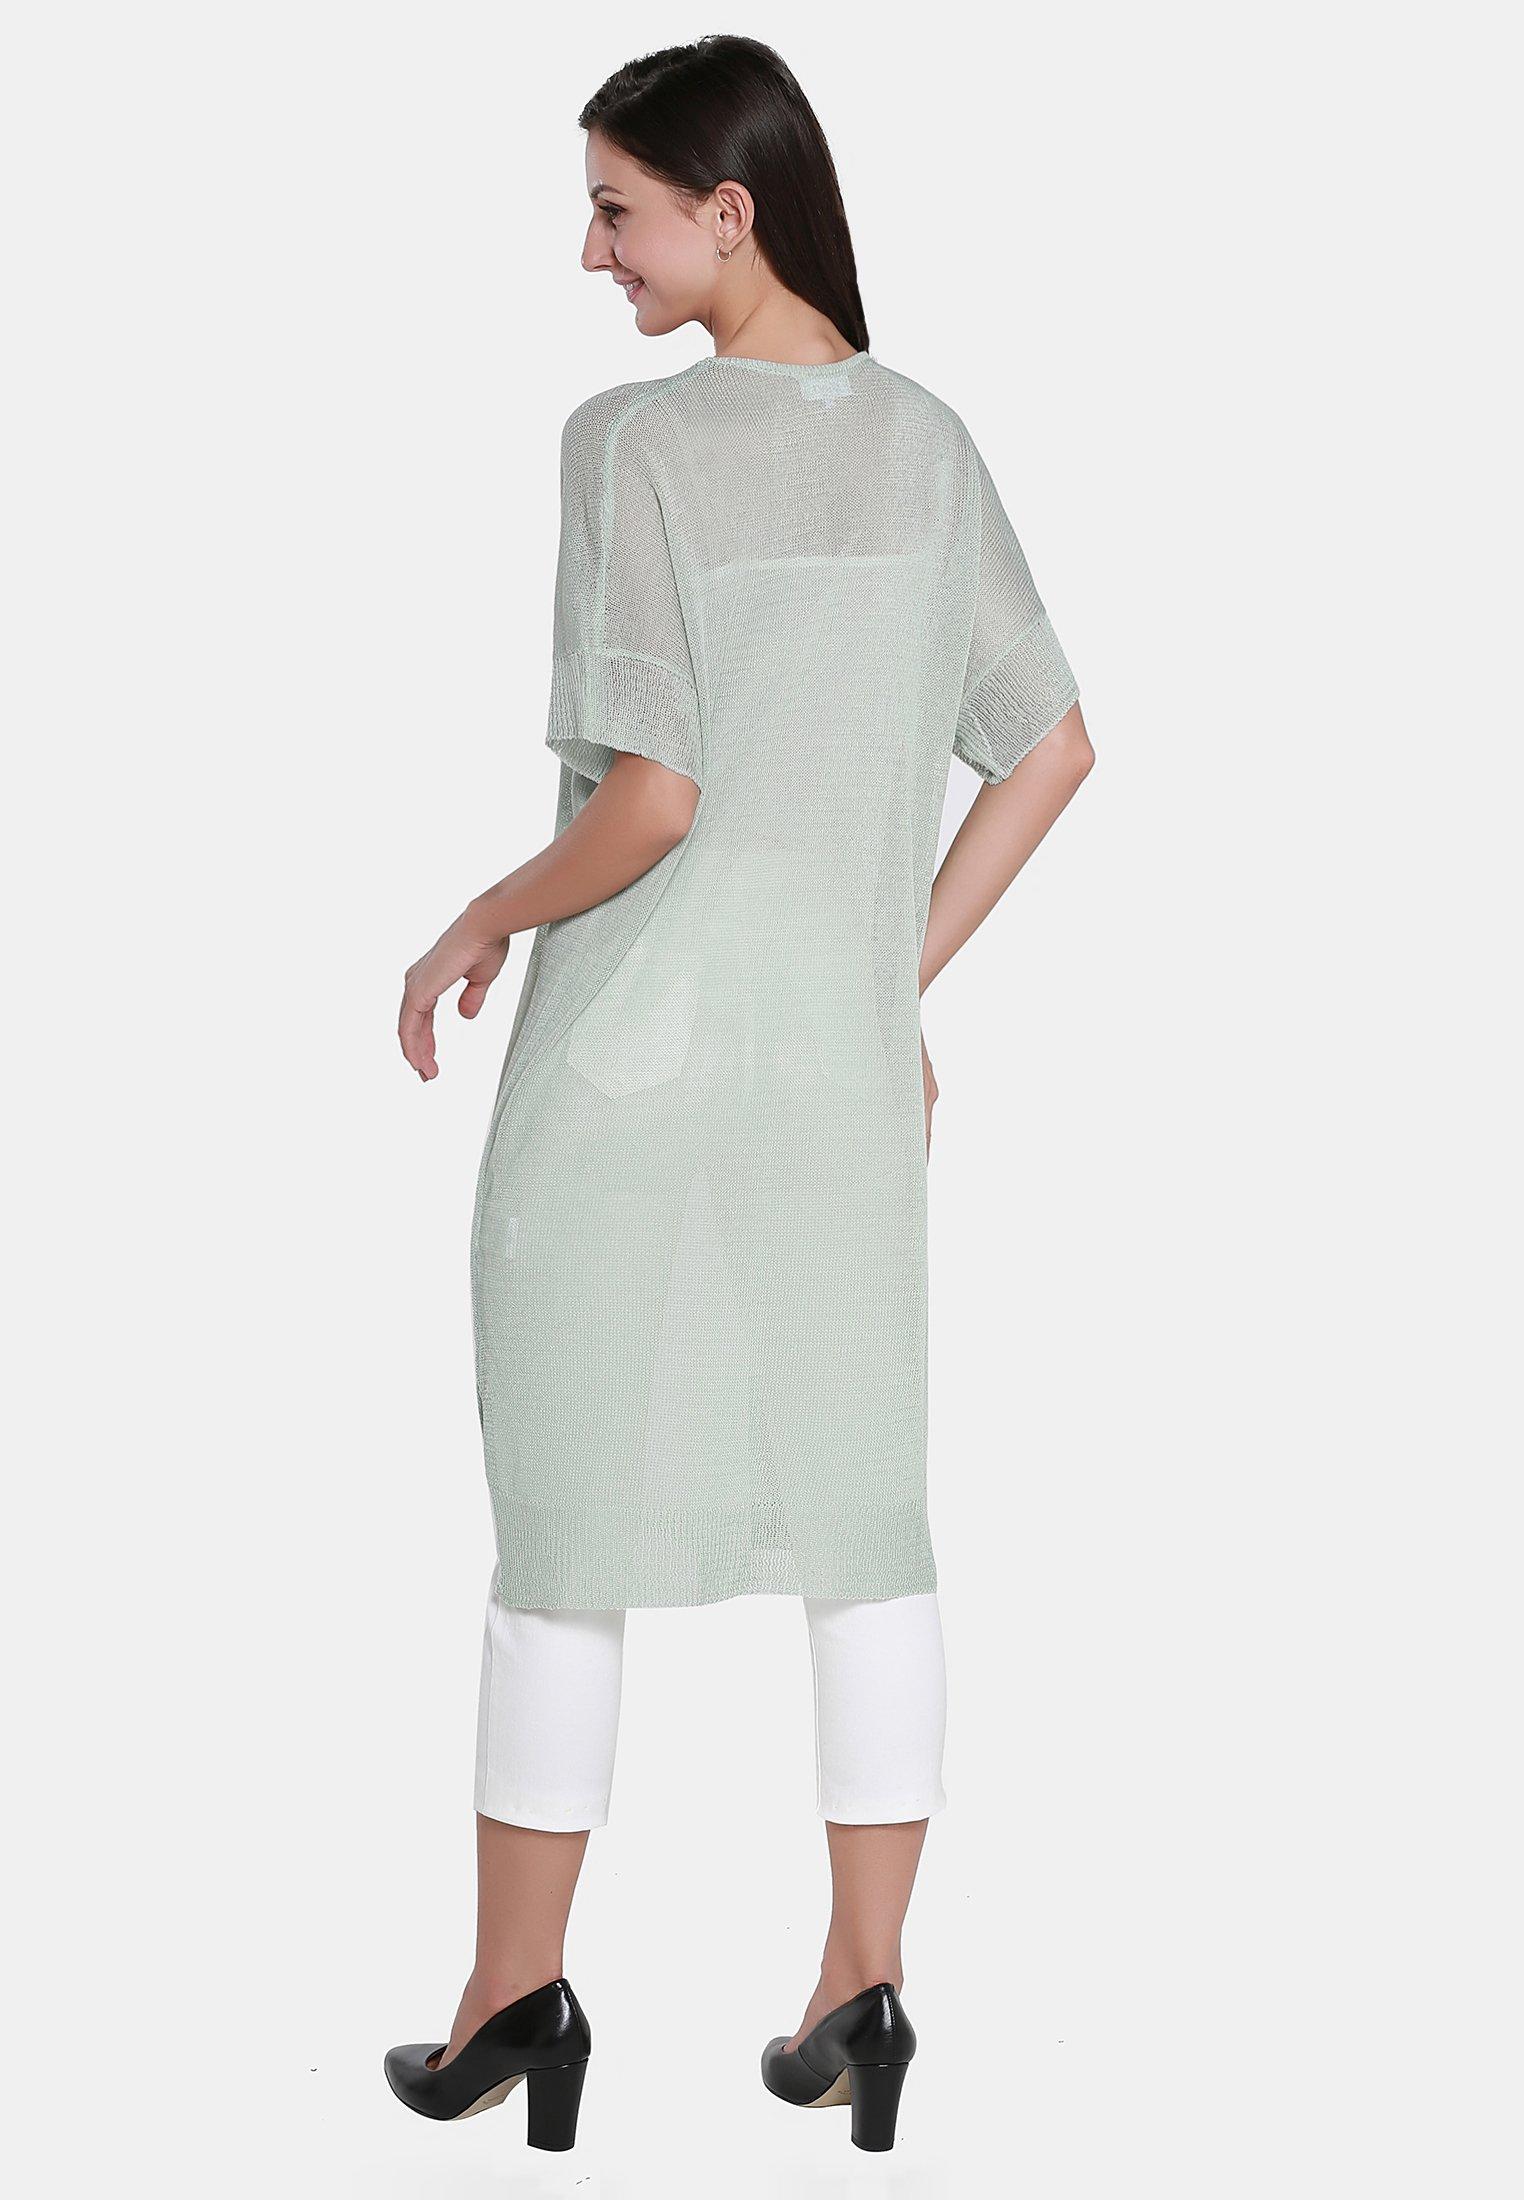 Discount Women's Clothing usha Cardigan mint FXFvp7g1U